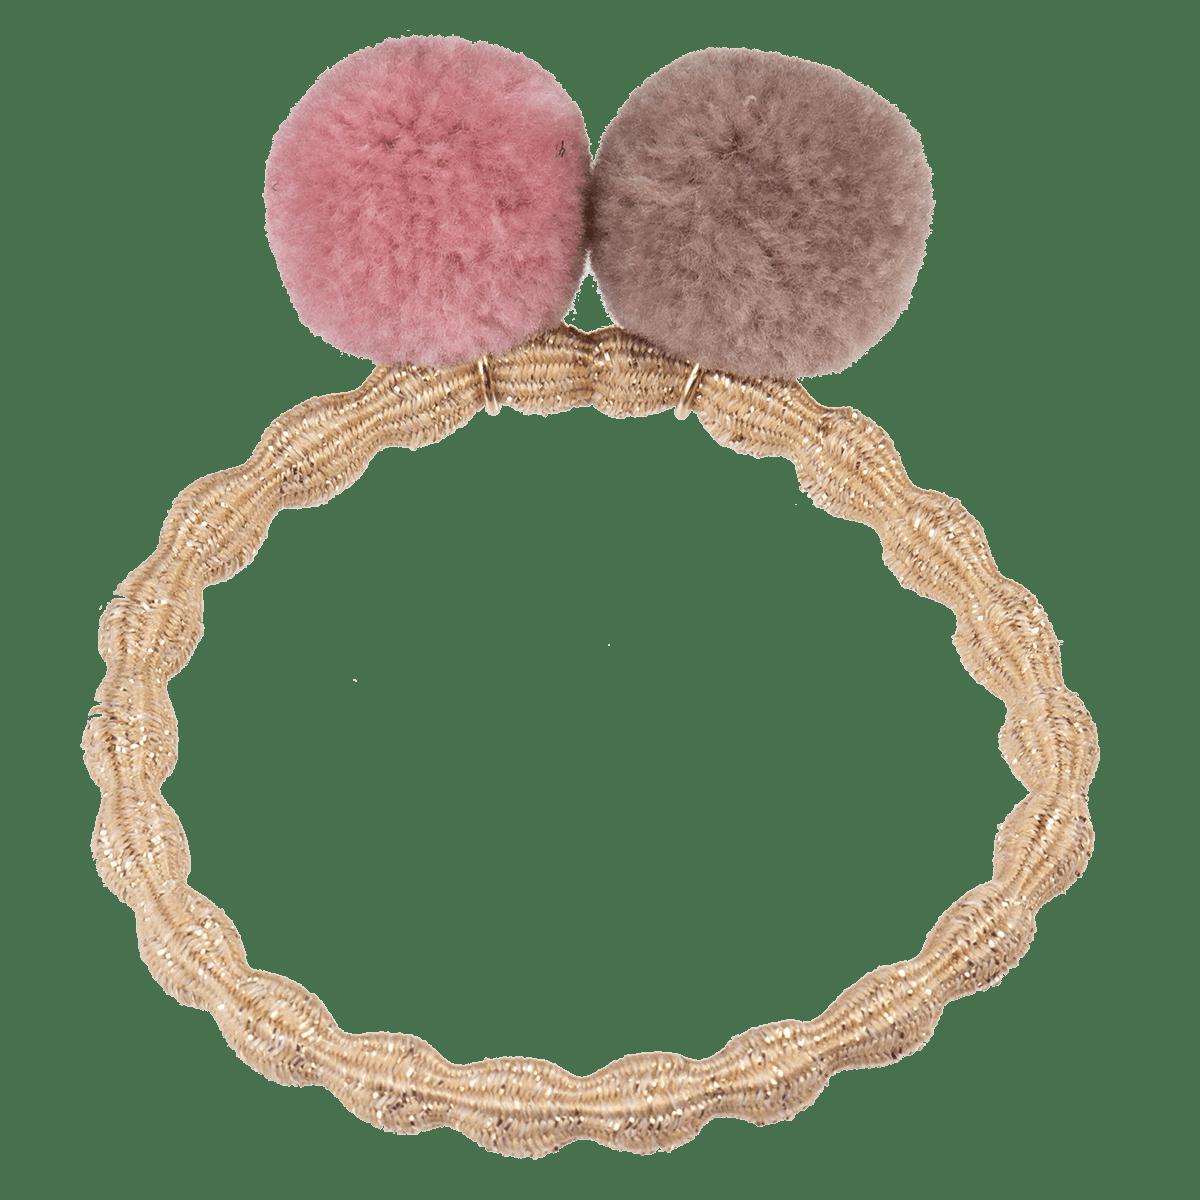 Haargummi Pom Pom- Beige glitter dusty rose 5215 - KKNEKKI